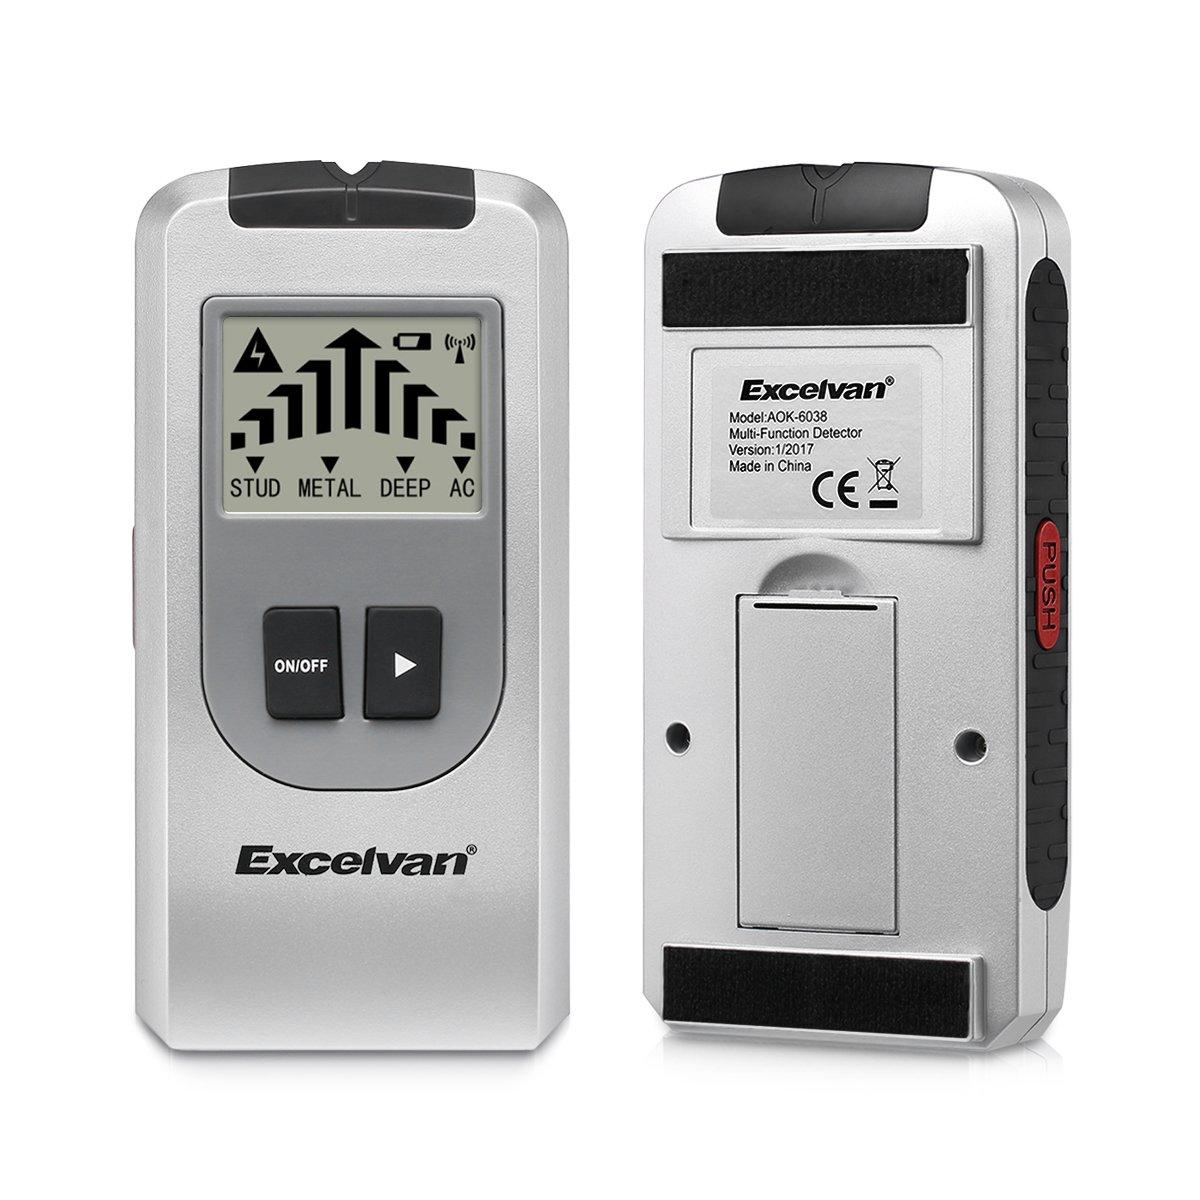 Excelvan AOK 6038 - Detector de Multifunción con Pantalla LCD (Detector de cables eléctricos, objetos metálicos, tuberías ocultas , madera), ...